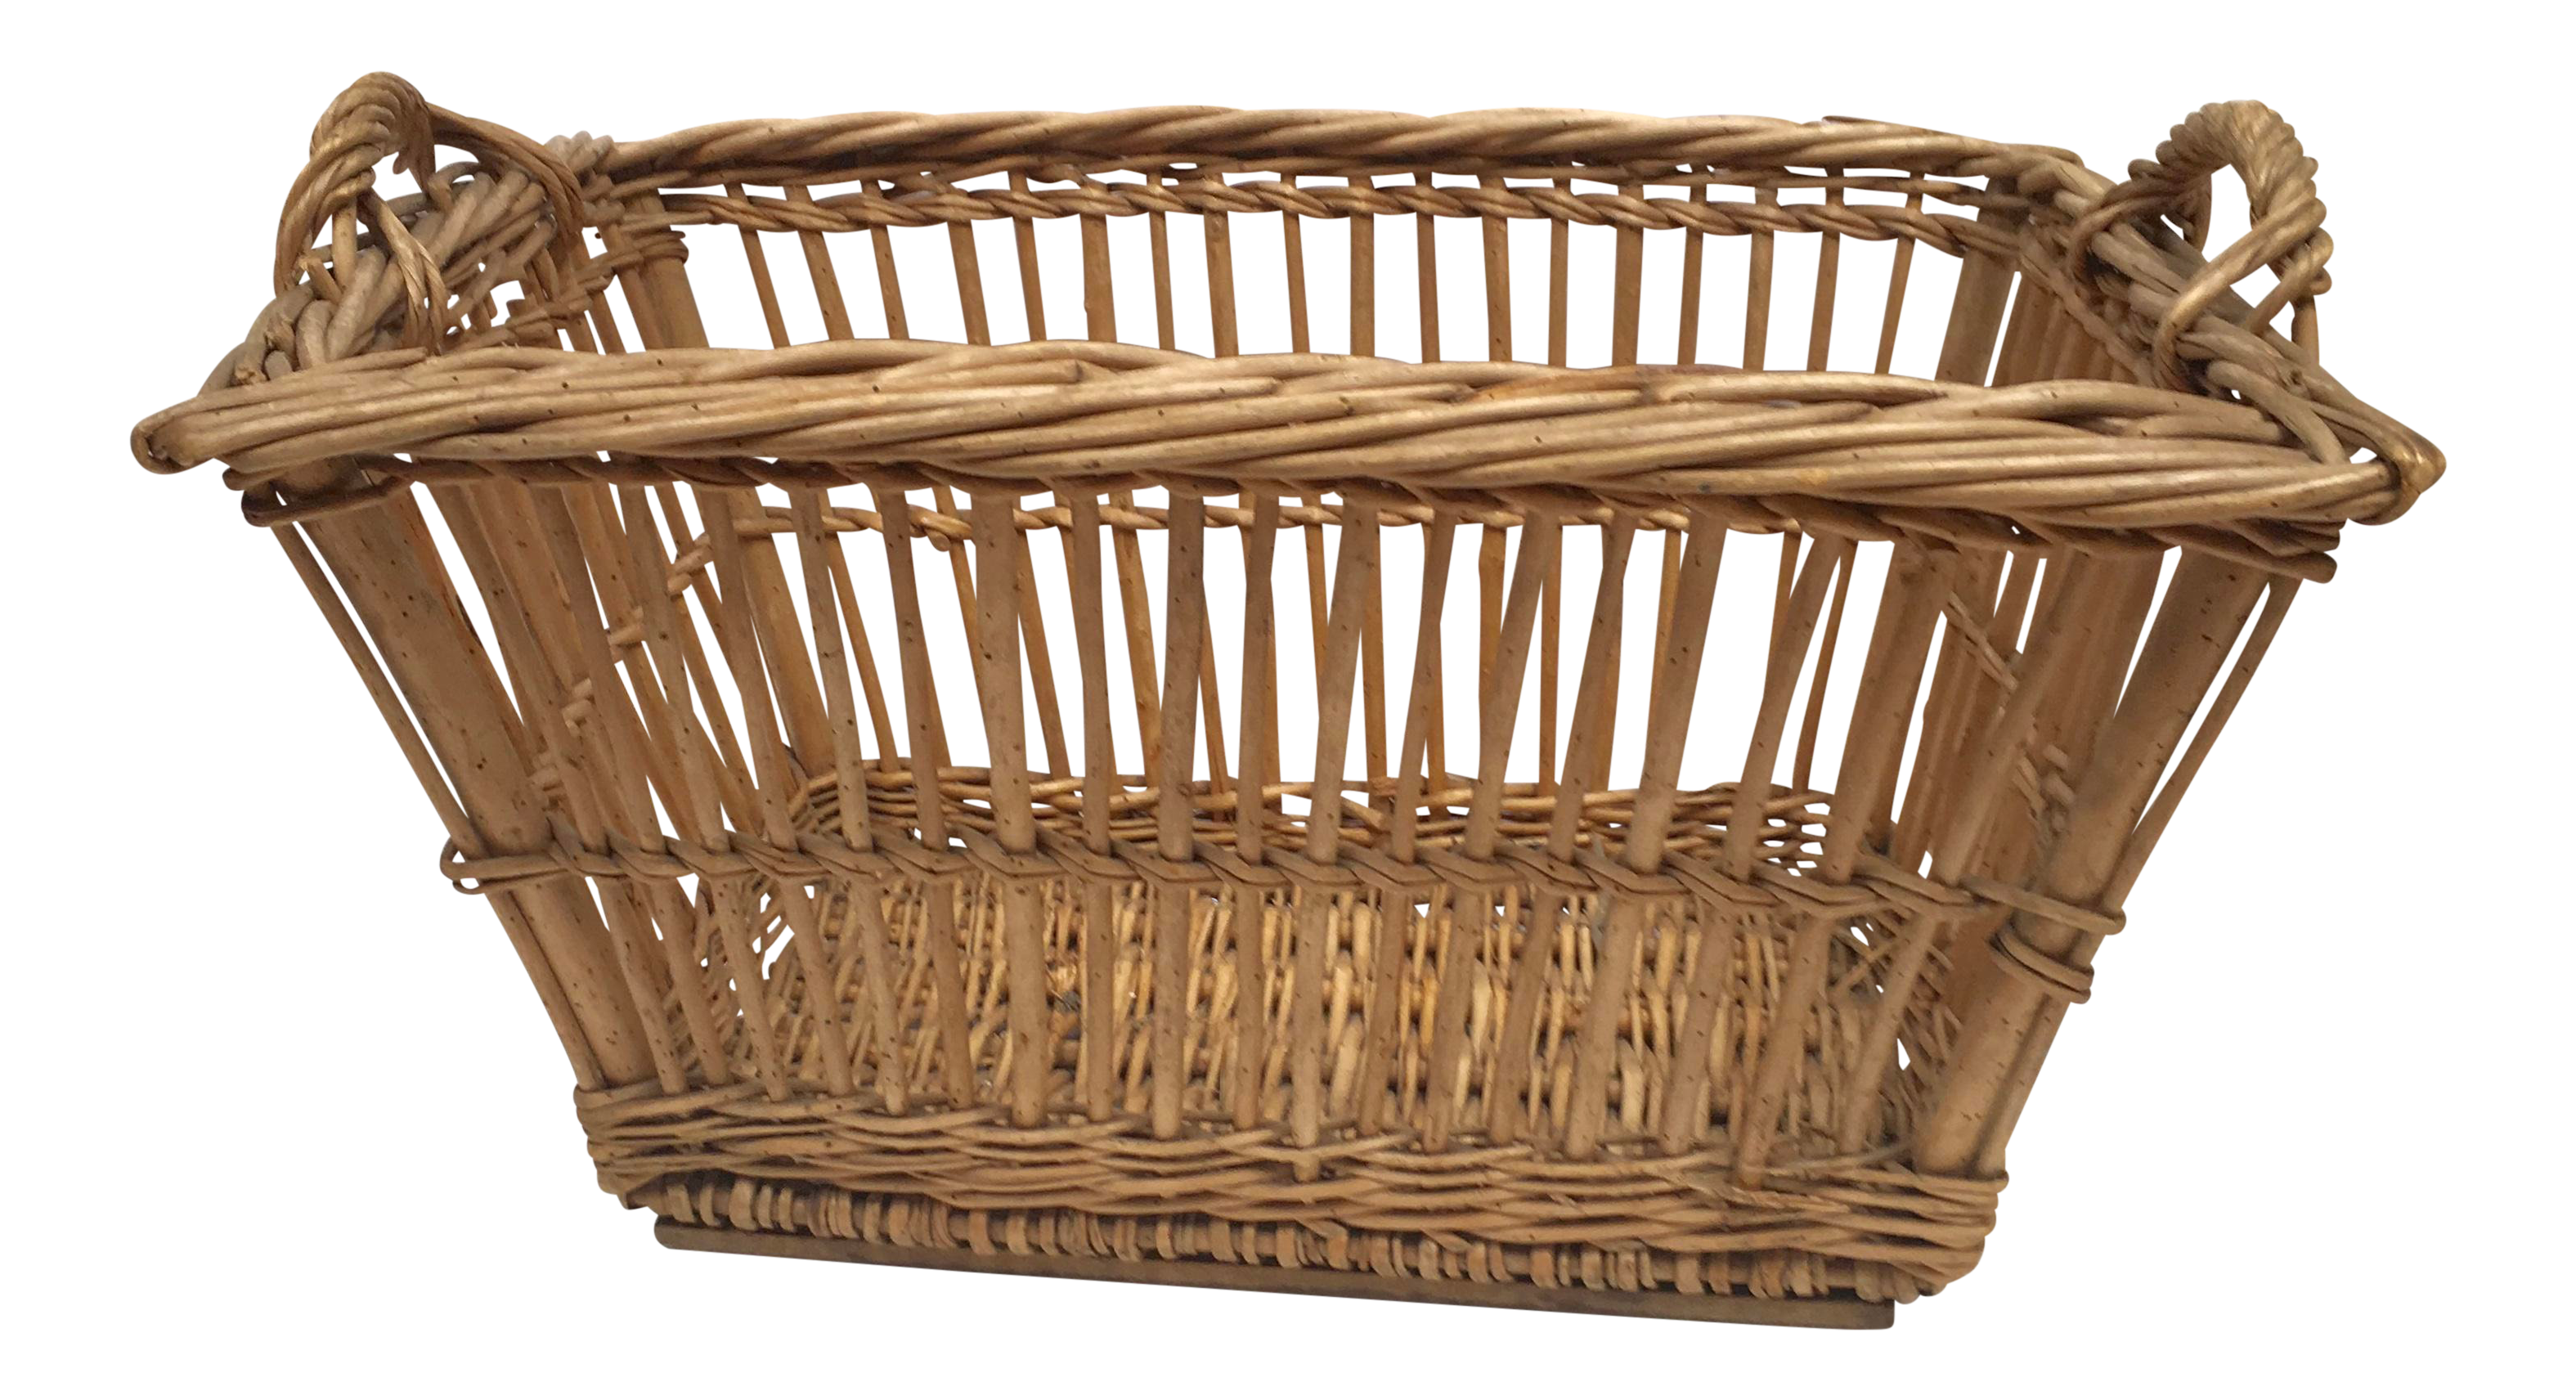 1900s French Woven Wicker Laundry Basket Basket Wicker Laundry Basket Wicker